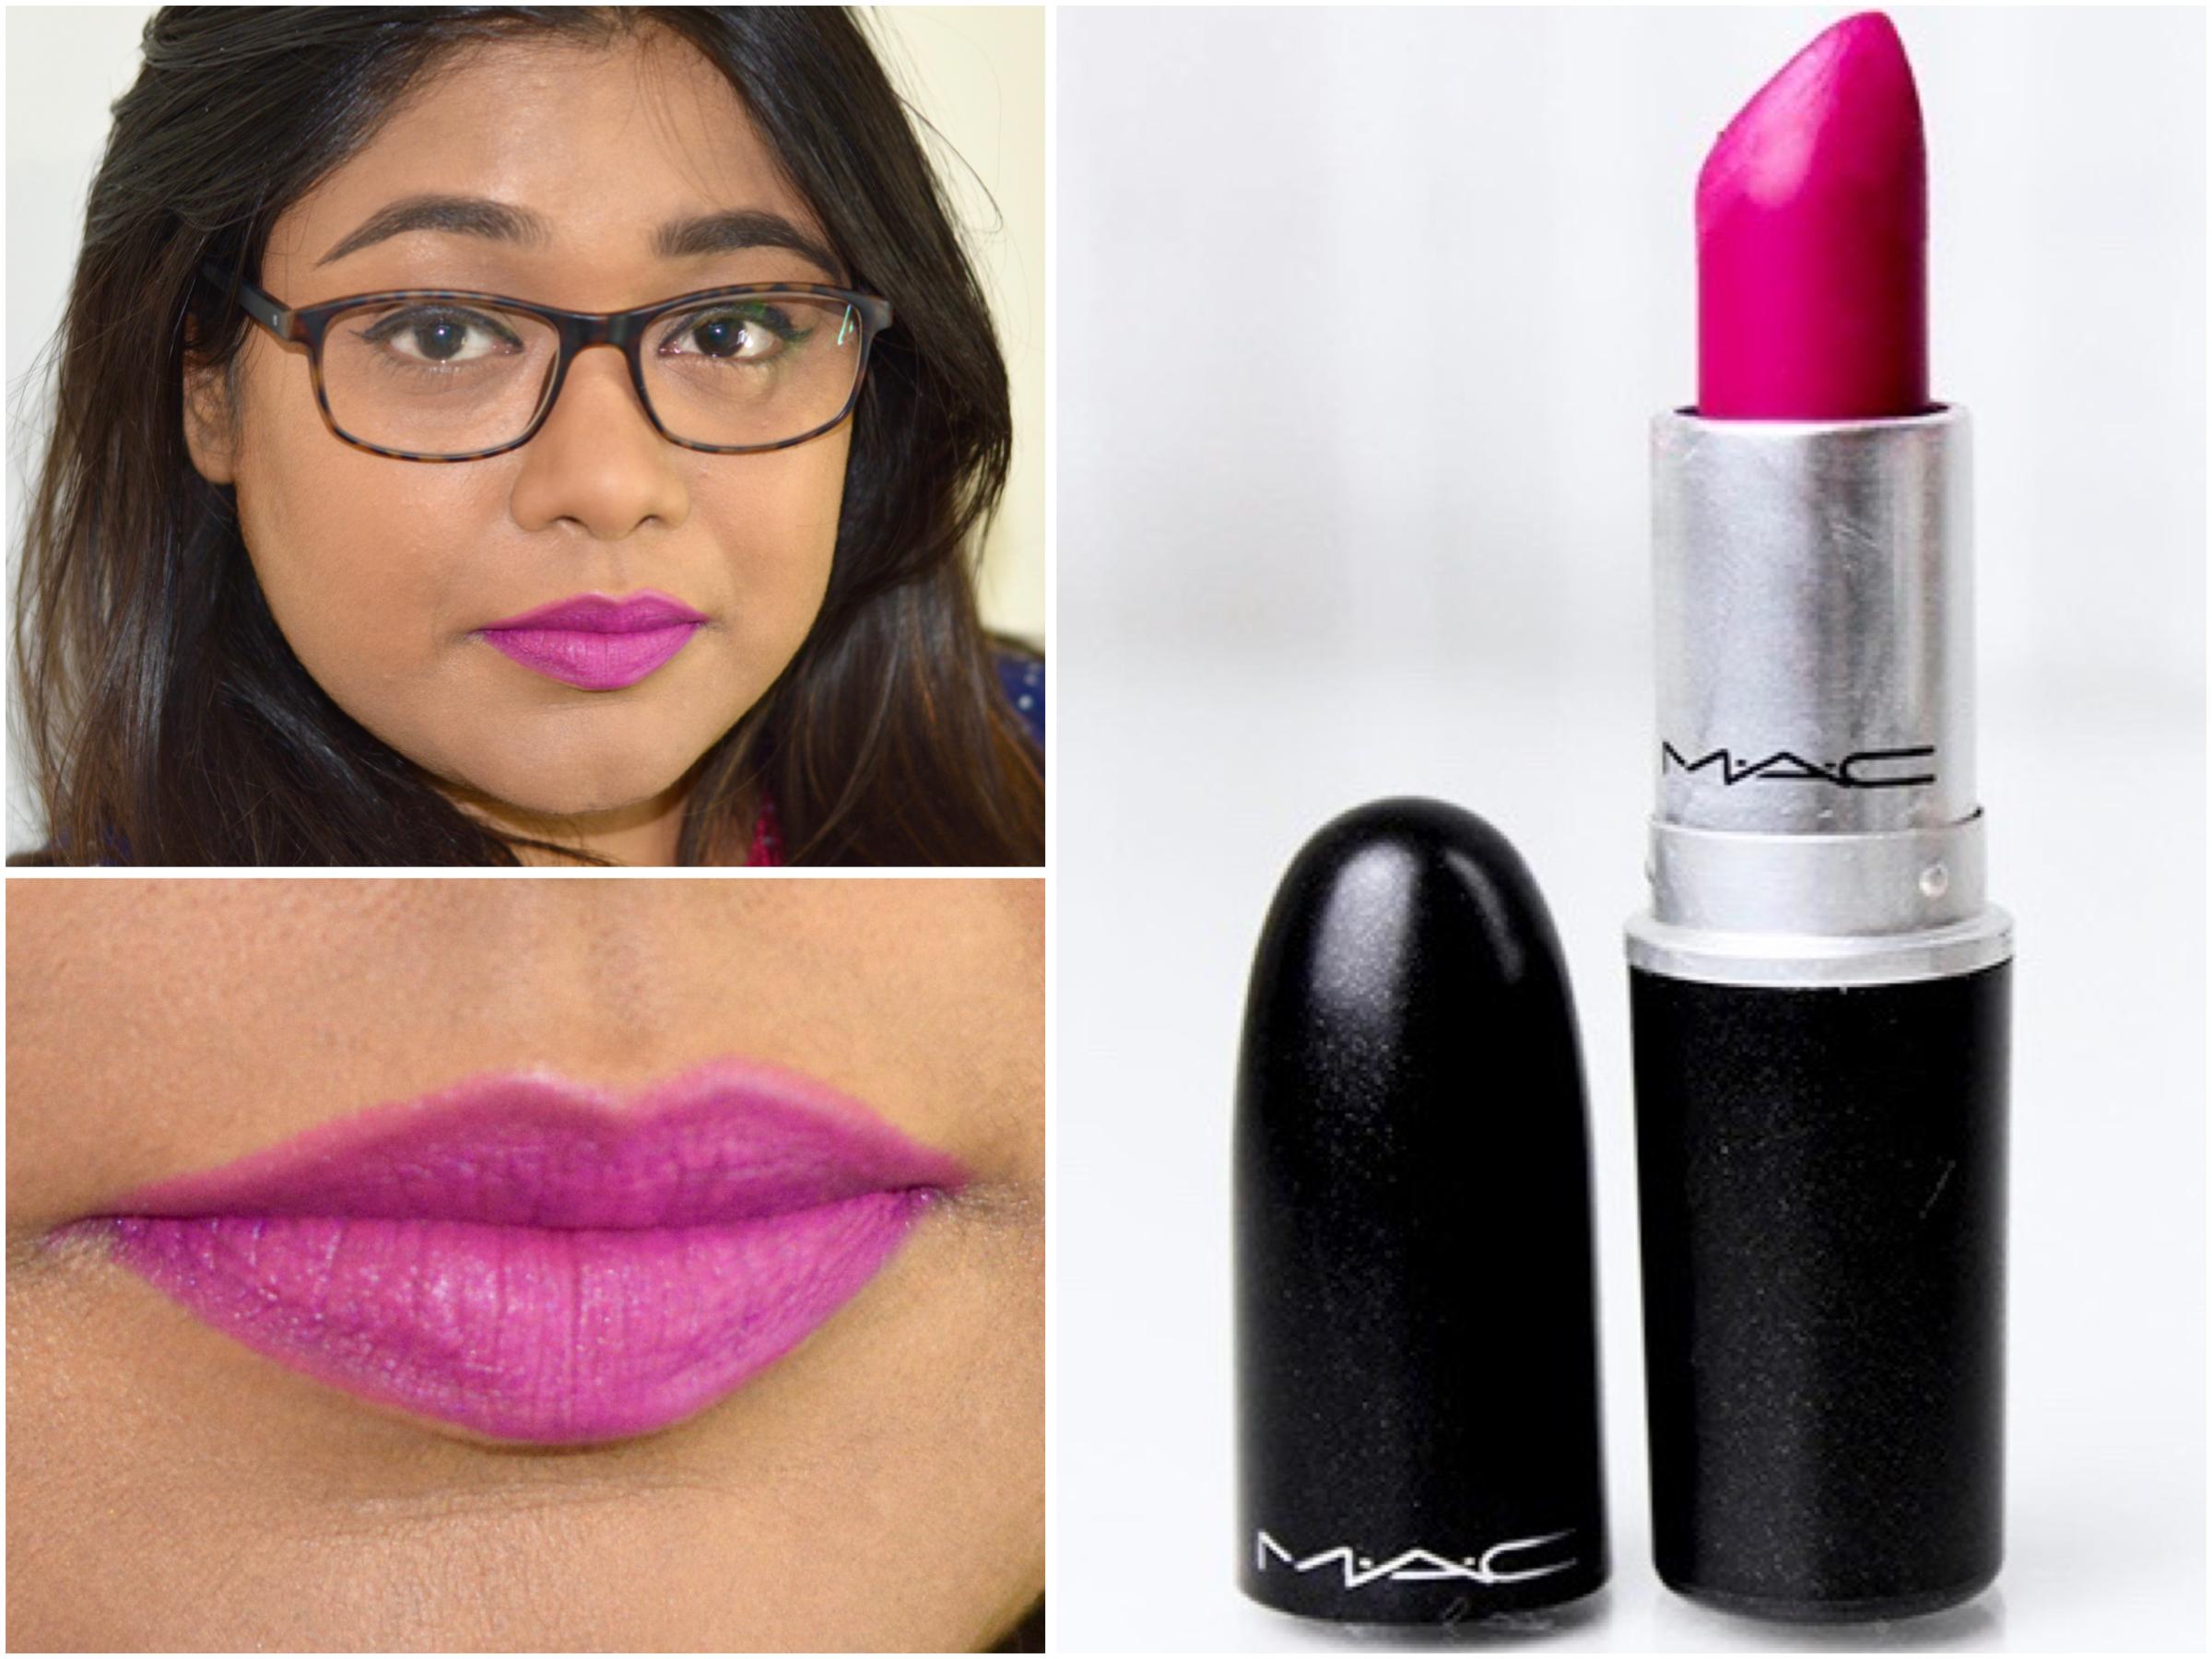 mac flatout fabulous lipstick for sale